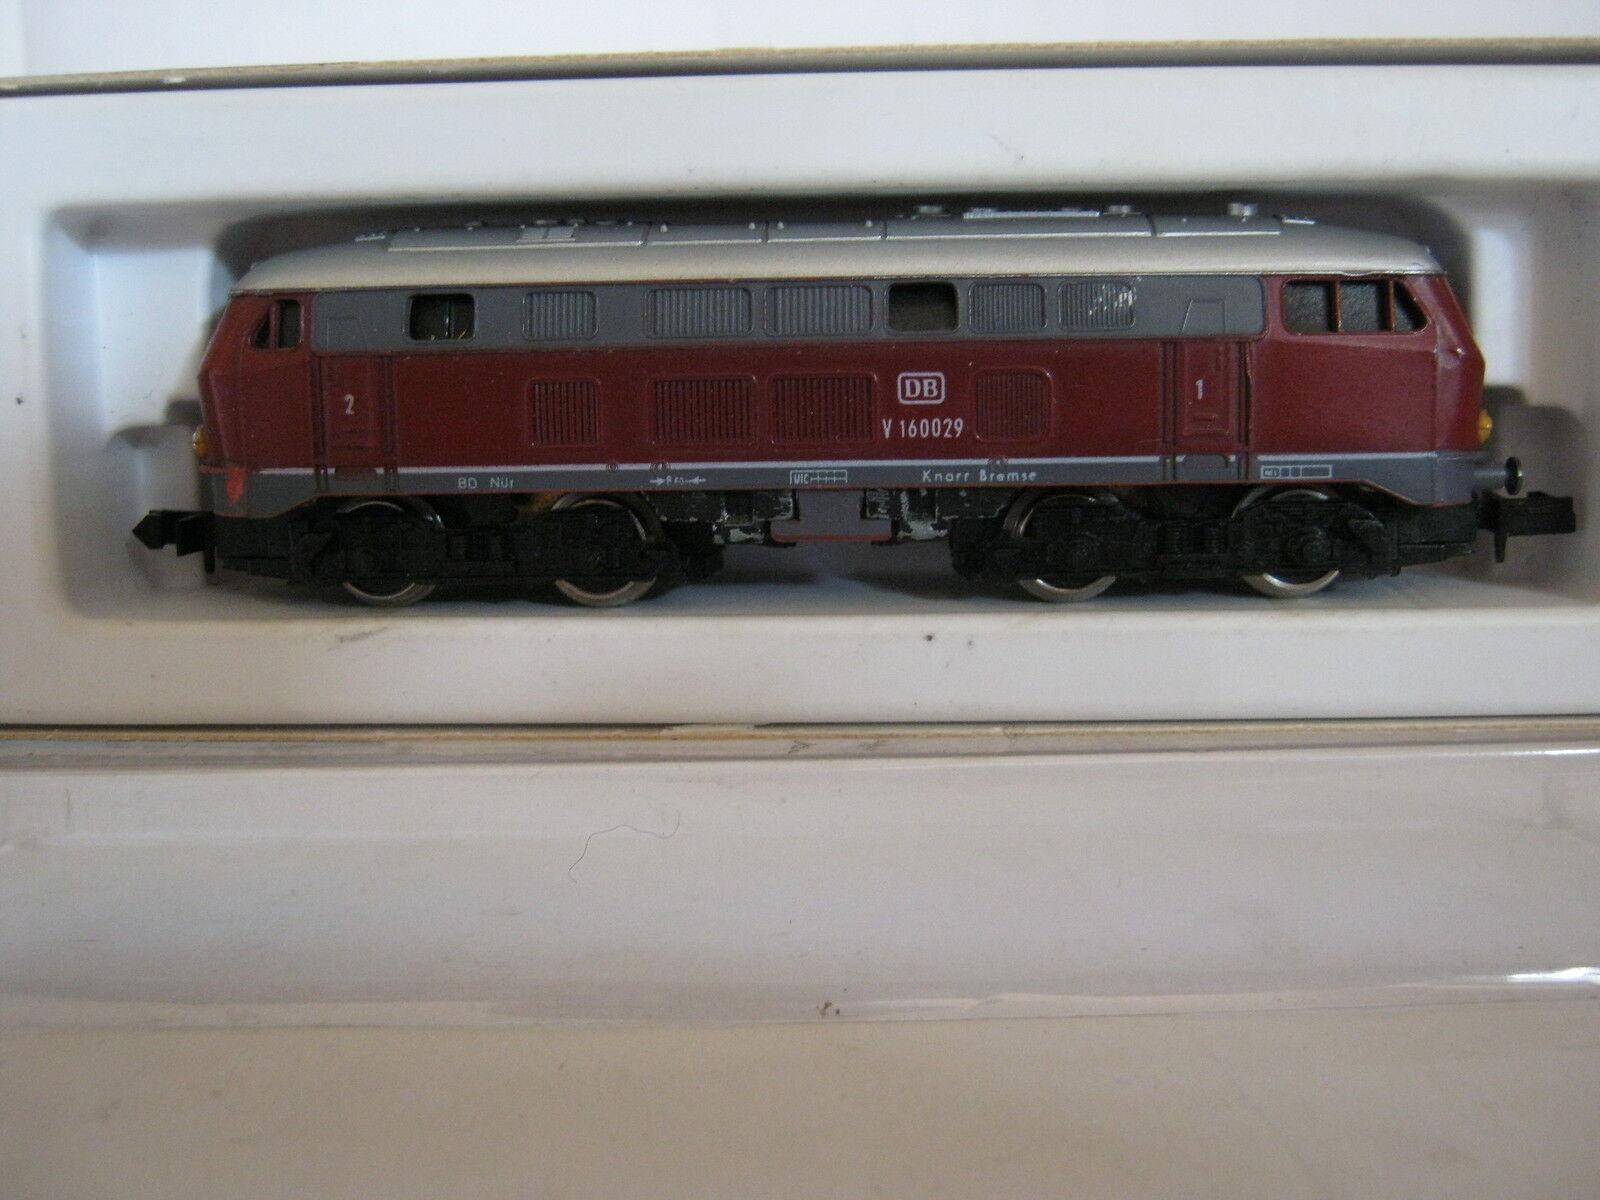 Arnold N 0205 Diesel-Lok btrnr V 160029 DB rosso (rg bh 32s5)